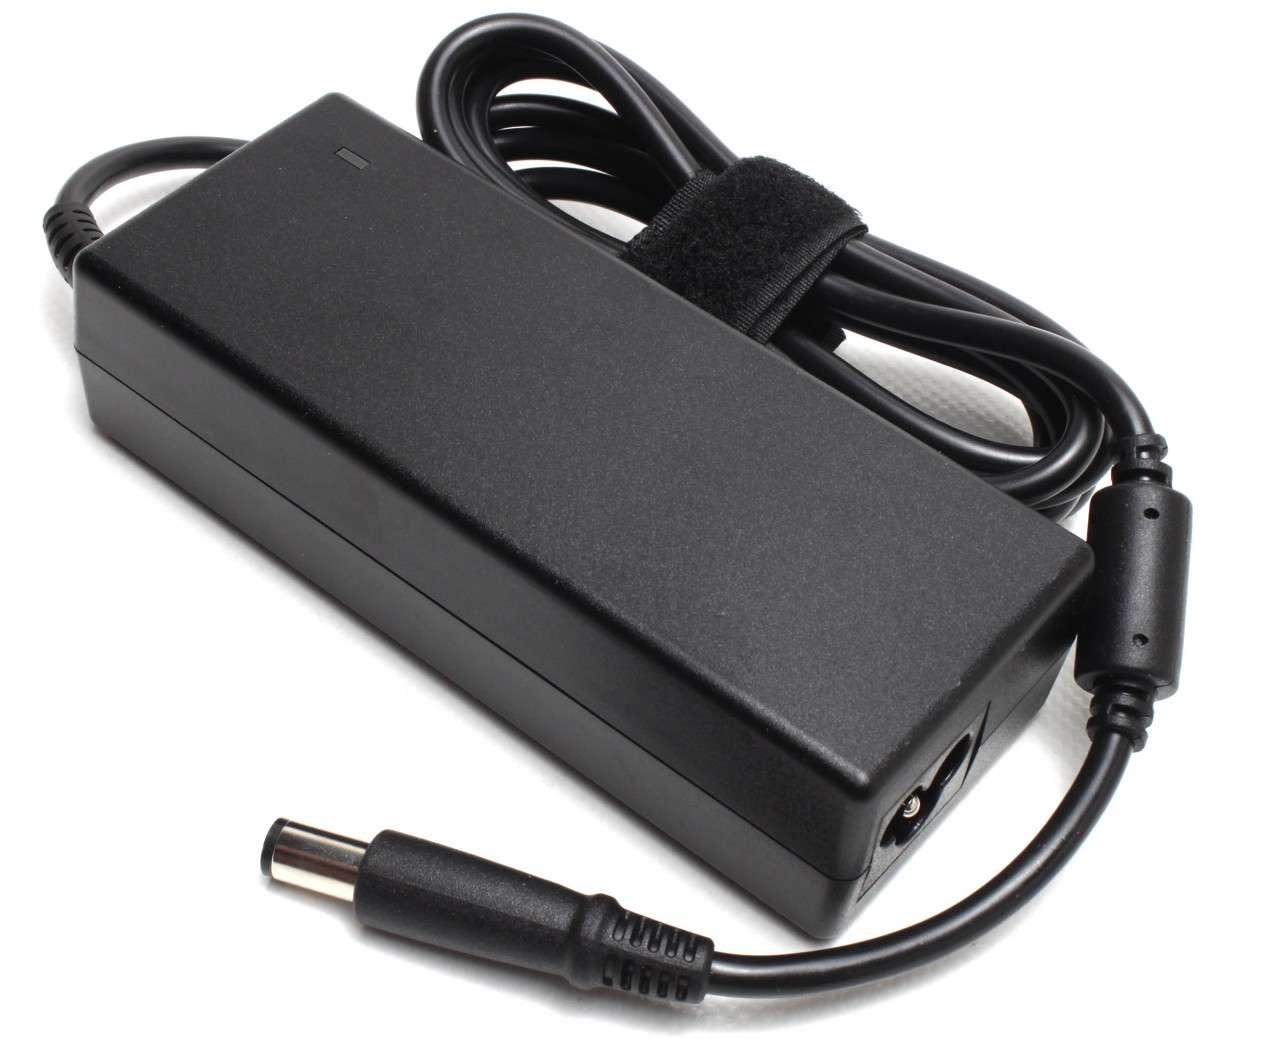 Incarcator Dell XPS M1210 VARIANTA 3 imagine powerlaptop.ro 2021